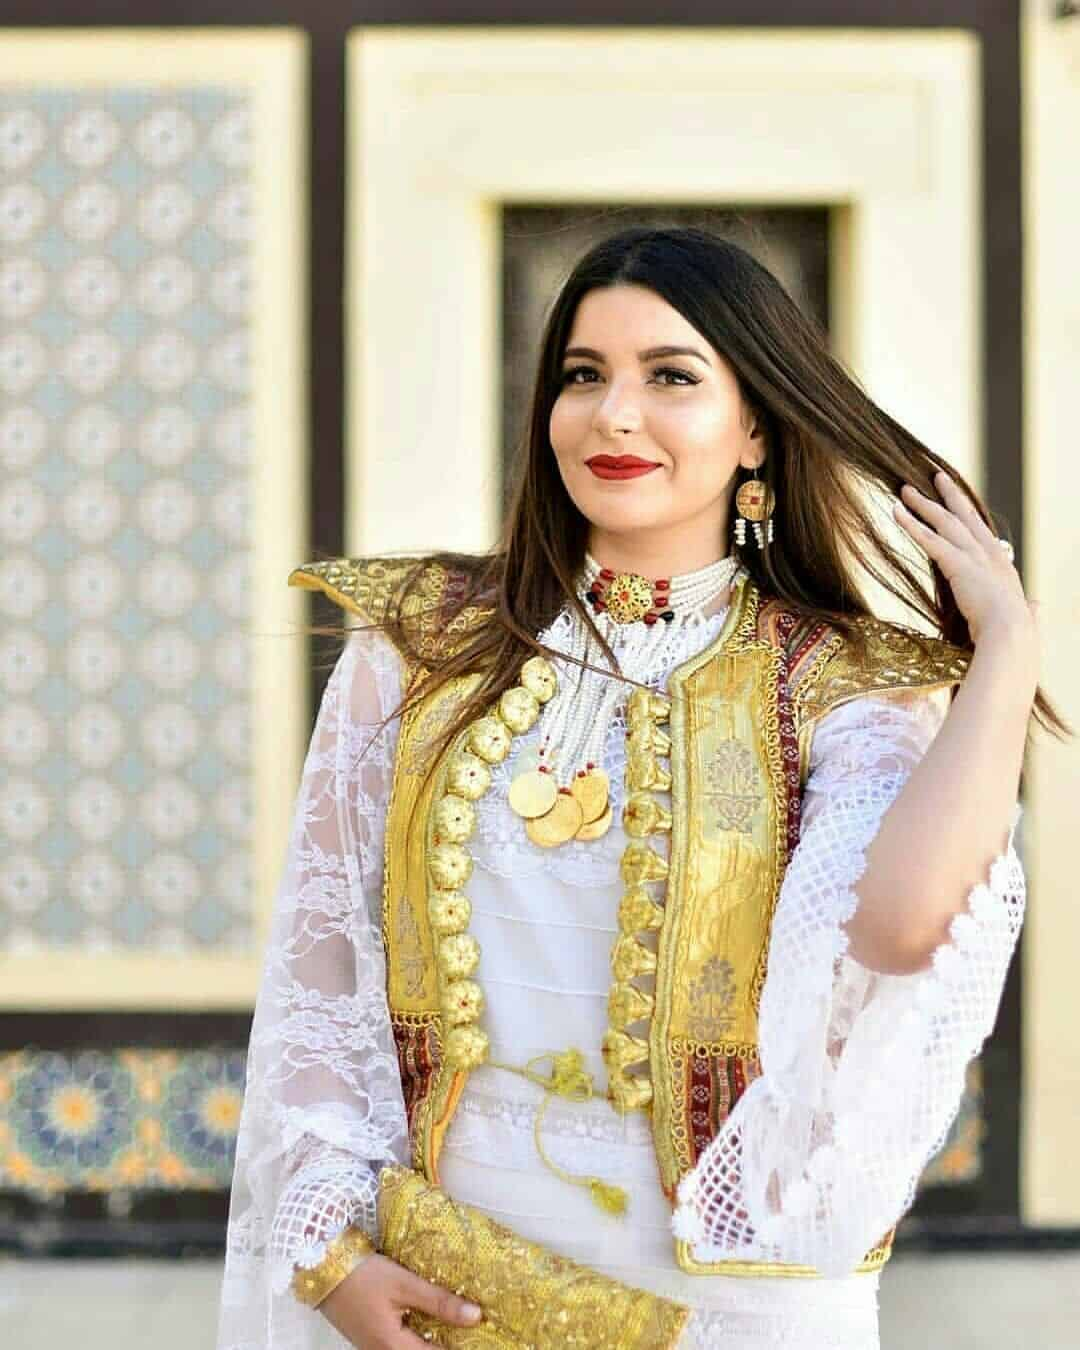 فستان زفاف عروس تونس